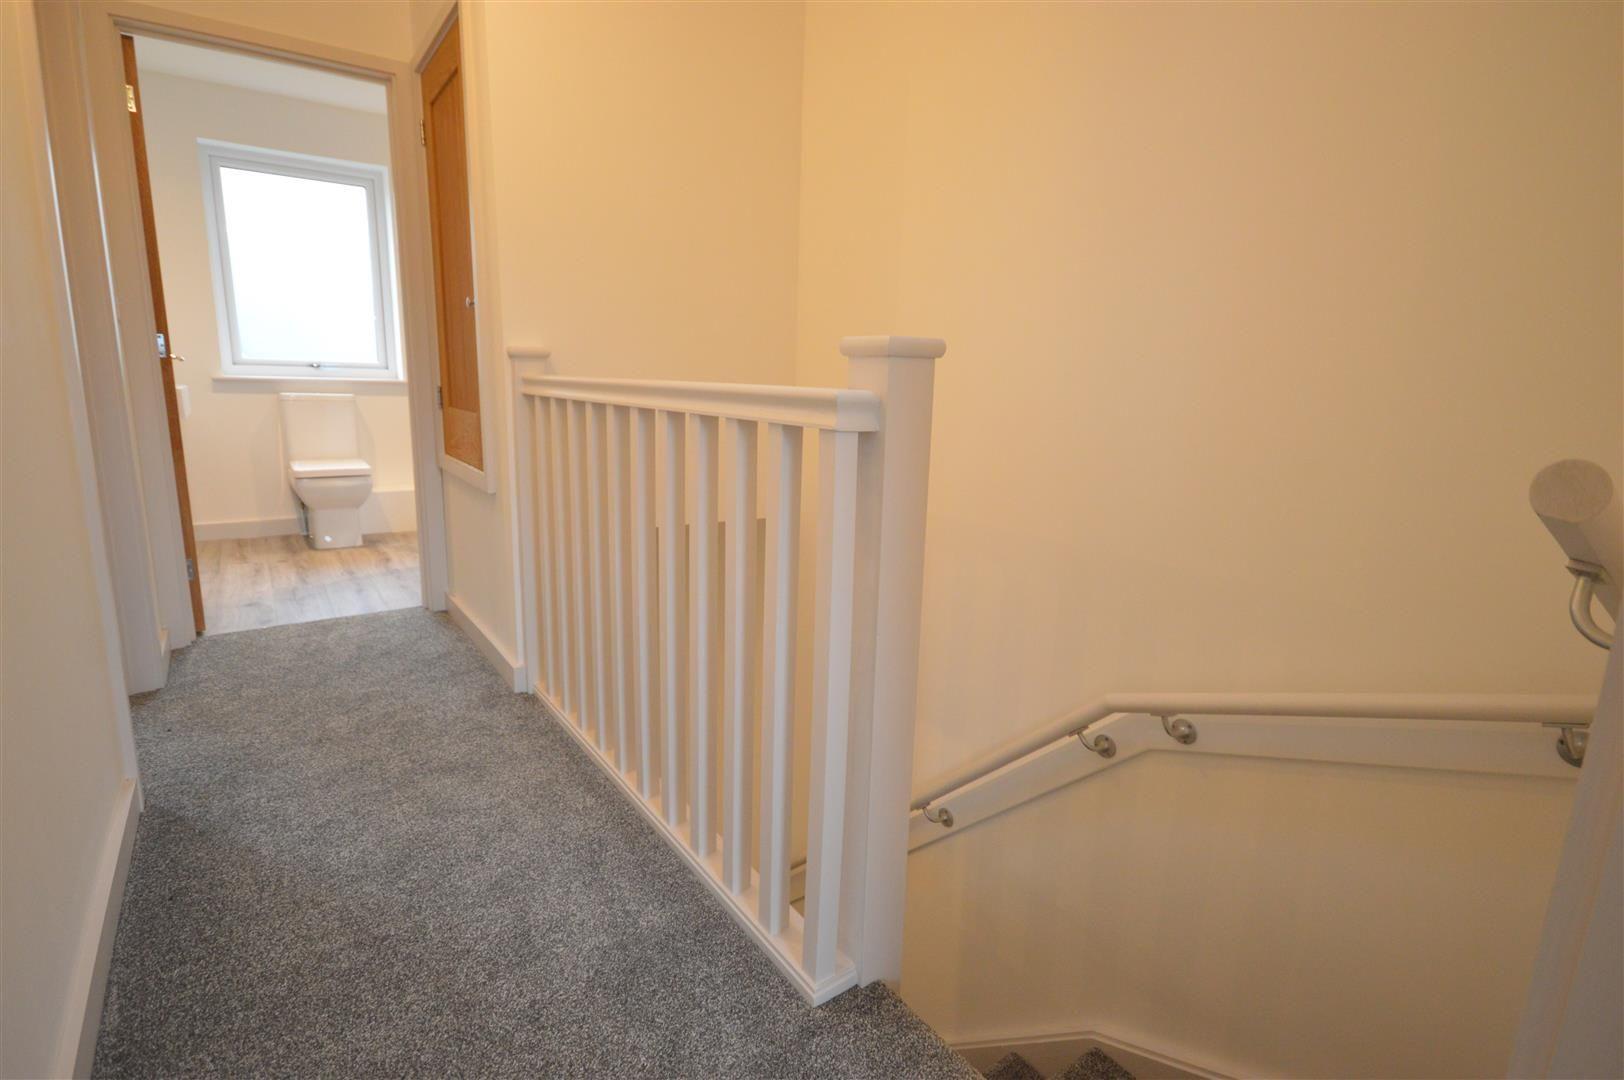 2 bed detached for sale in Leominster  - Property Image 11